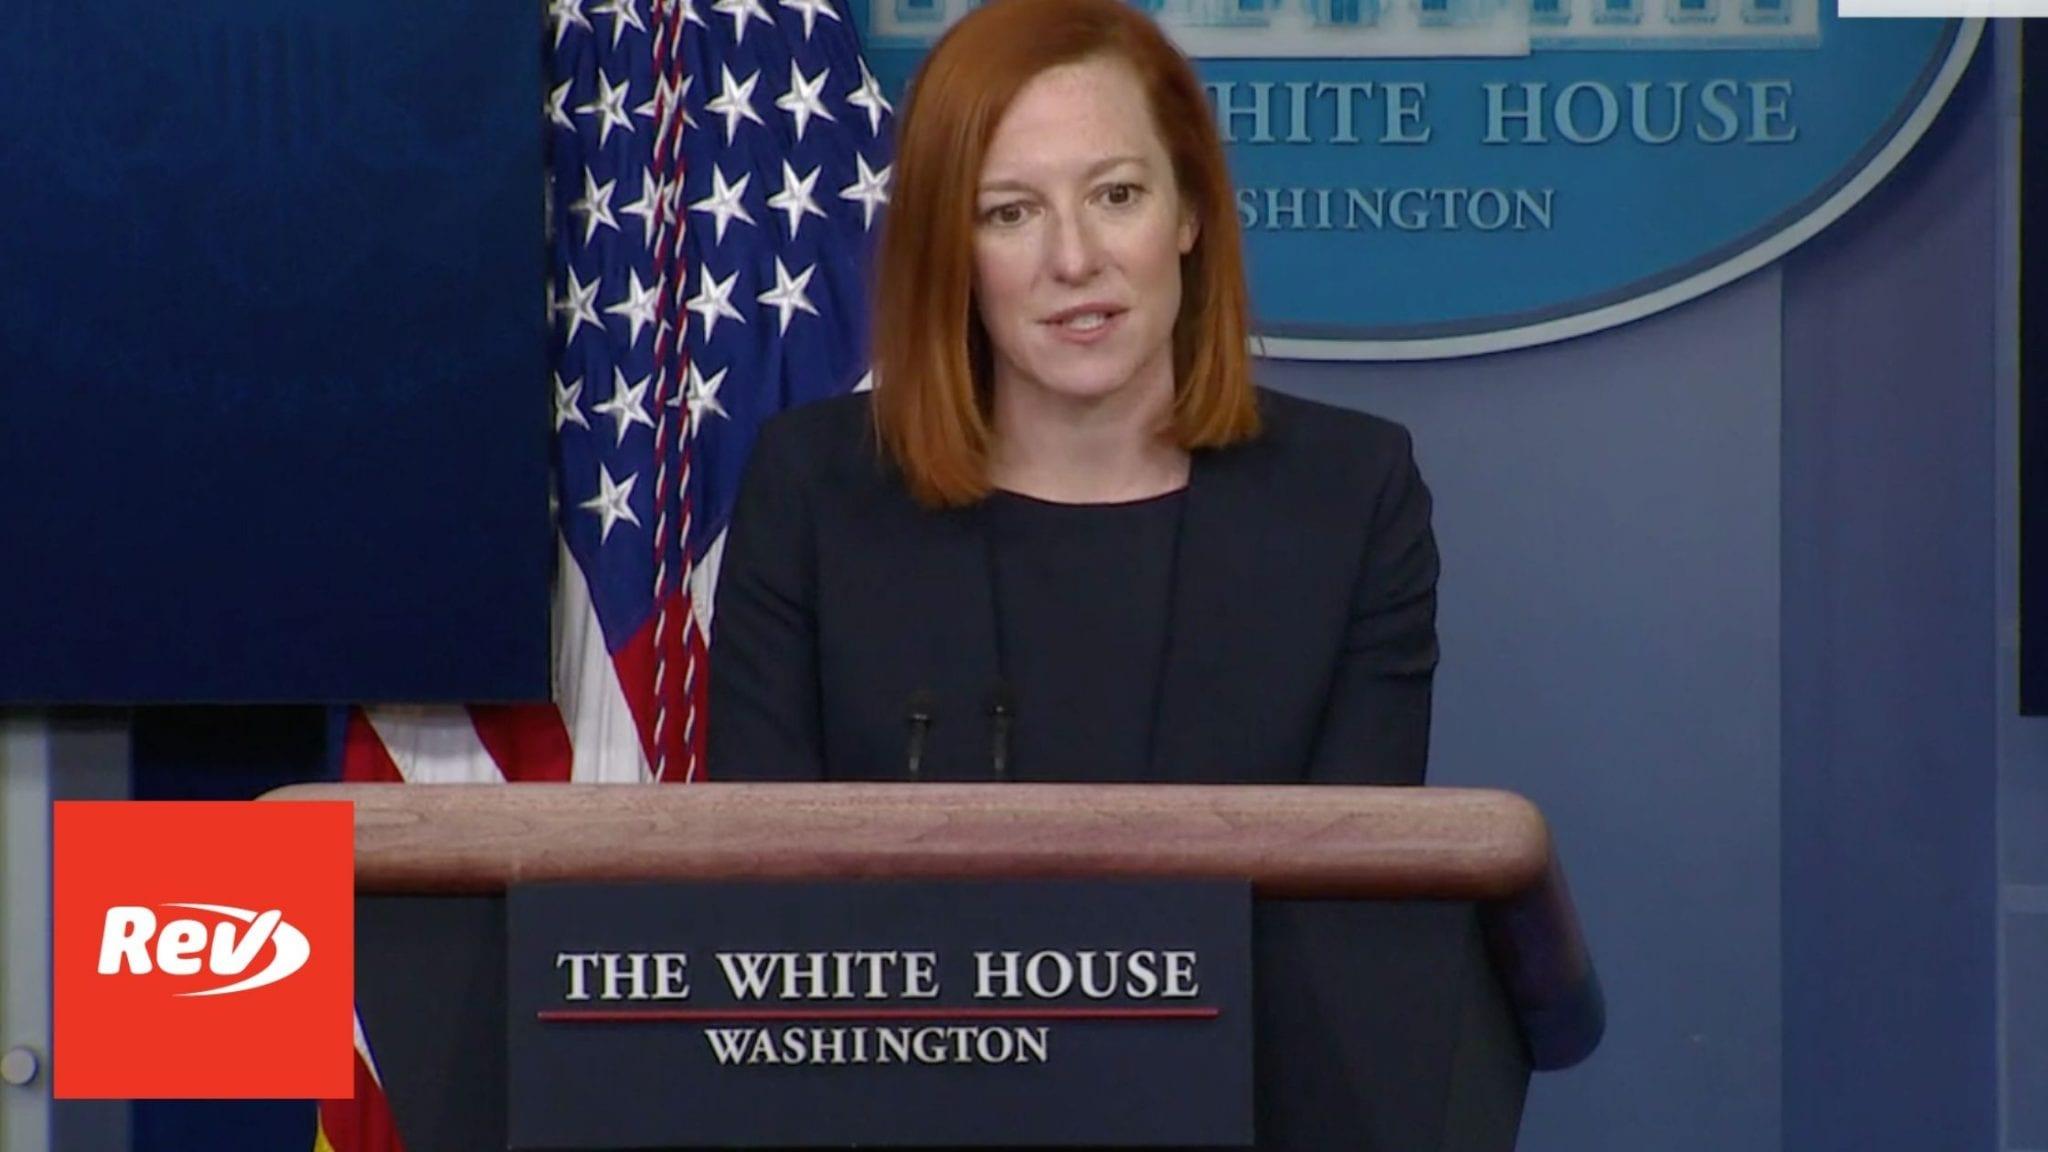 Press Secretary Jen Psaki White House Press Conference Transcript February 12